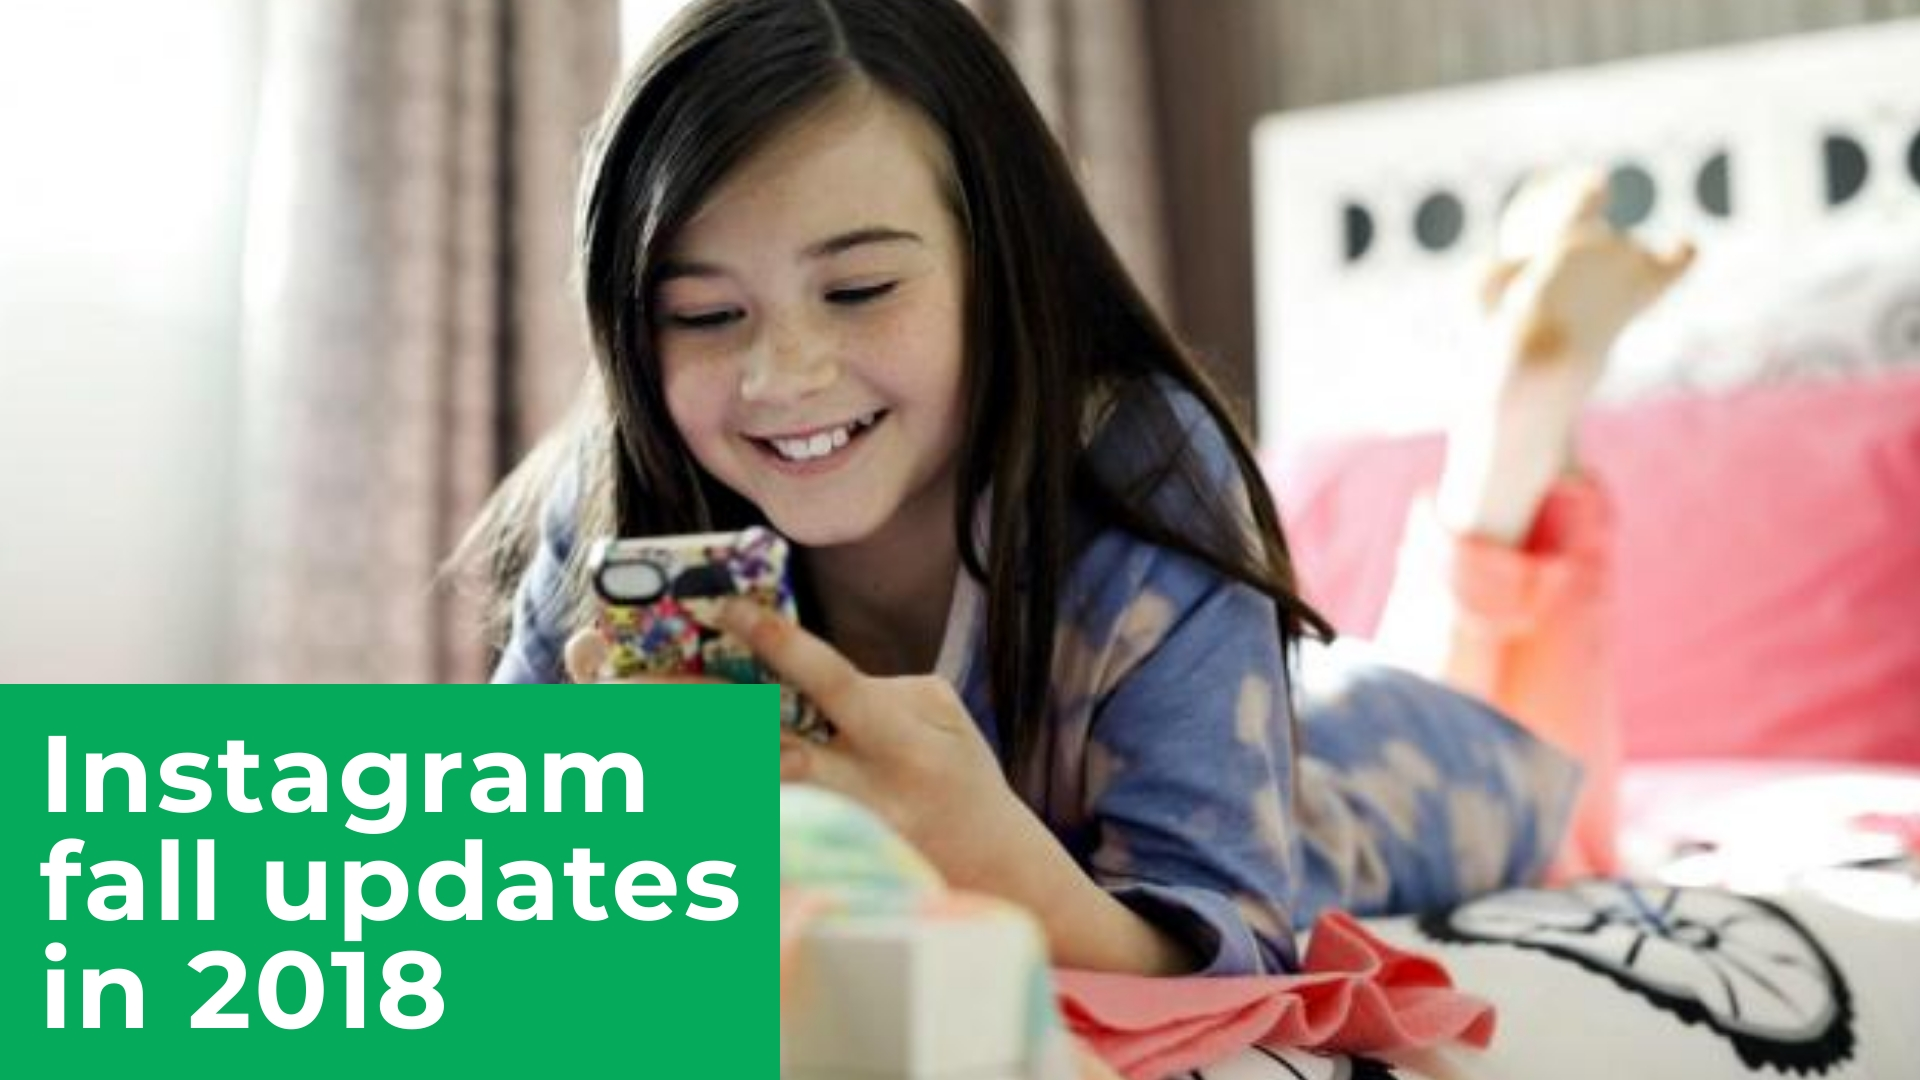 Instagram fall updates in 2018